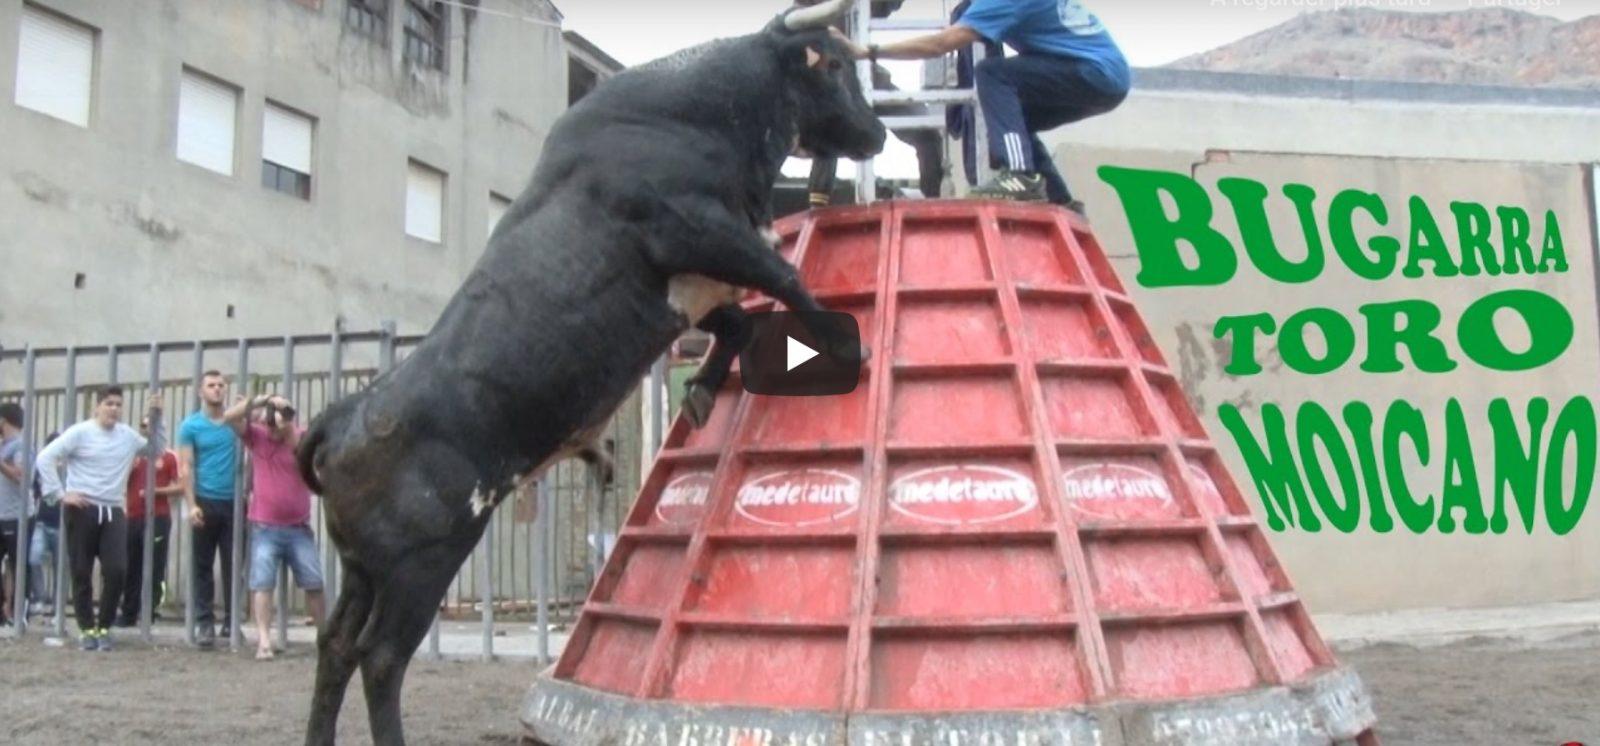 BUGARRA – Ganaderia El Cali FAMOSO Toro Moicano – VIDEO TOROS SAM VALENCIA